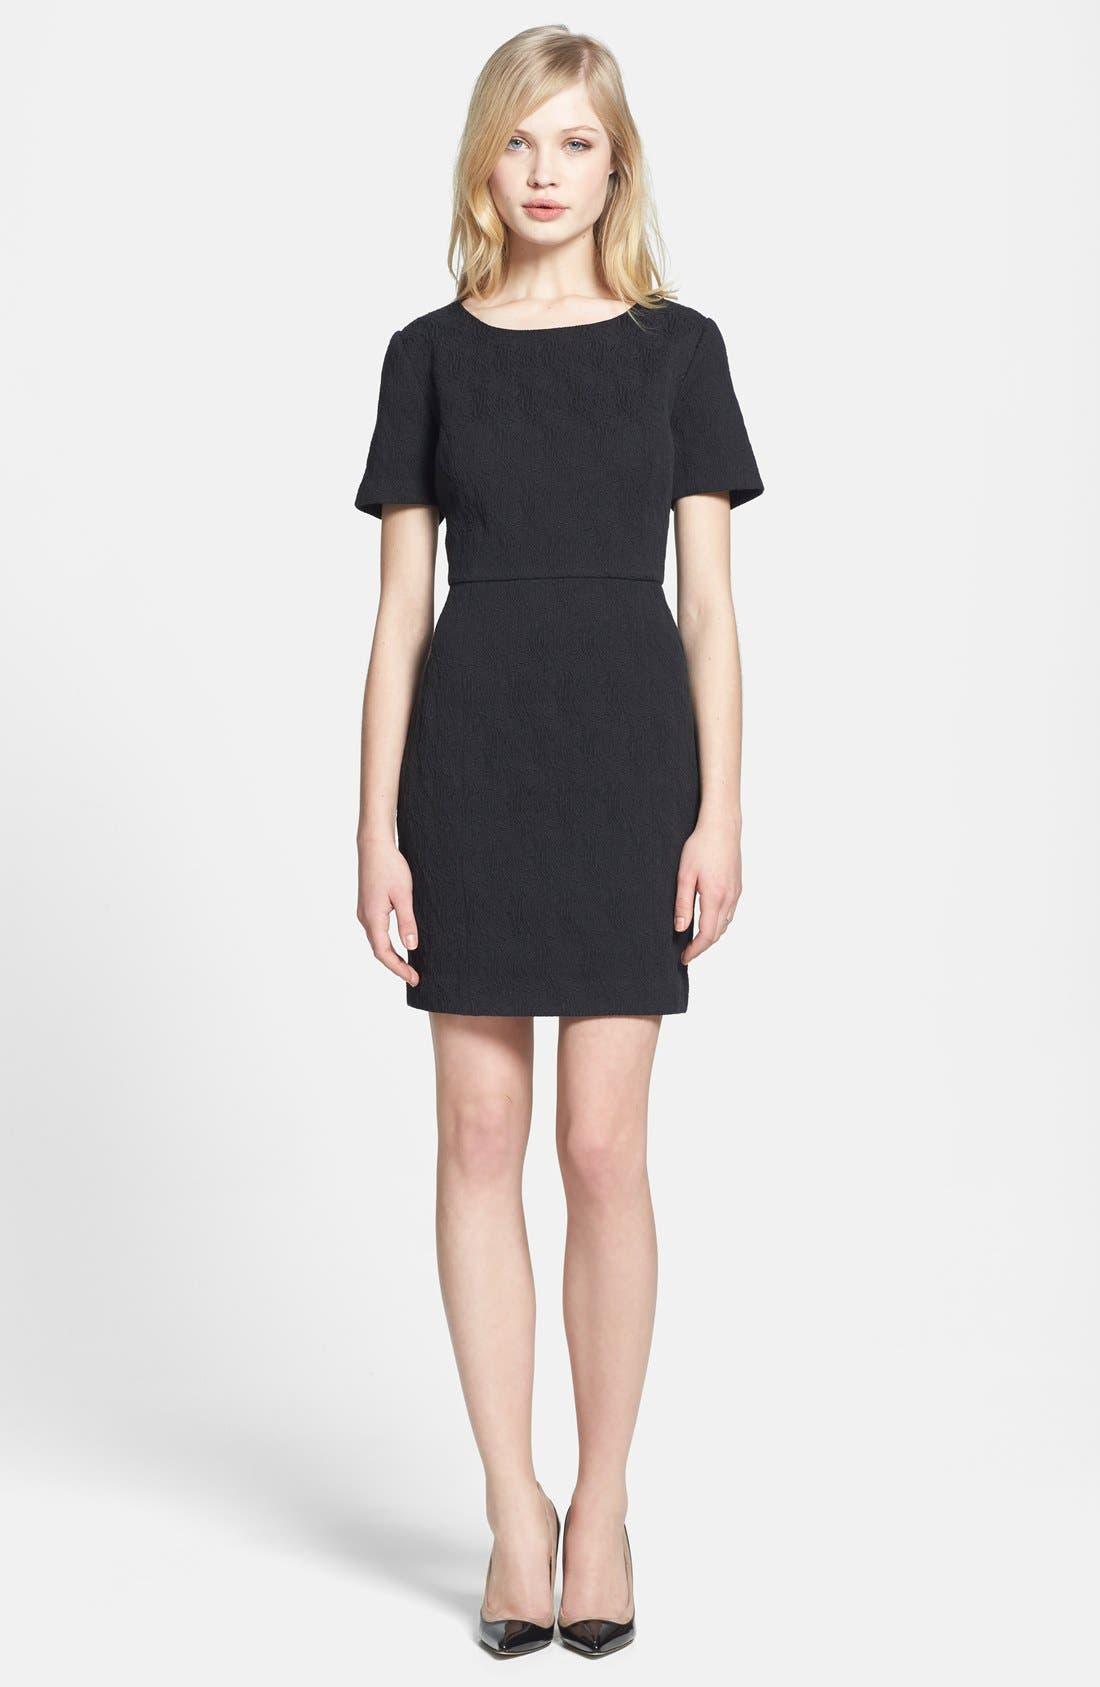 Main Image - Chelsea28 Back Cutout Jacquard Dress